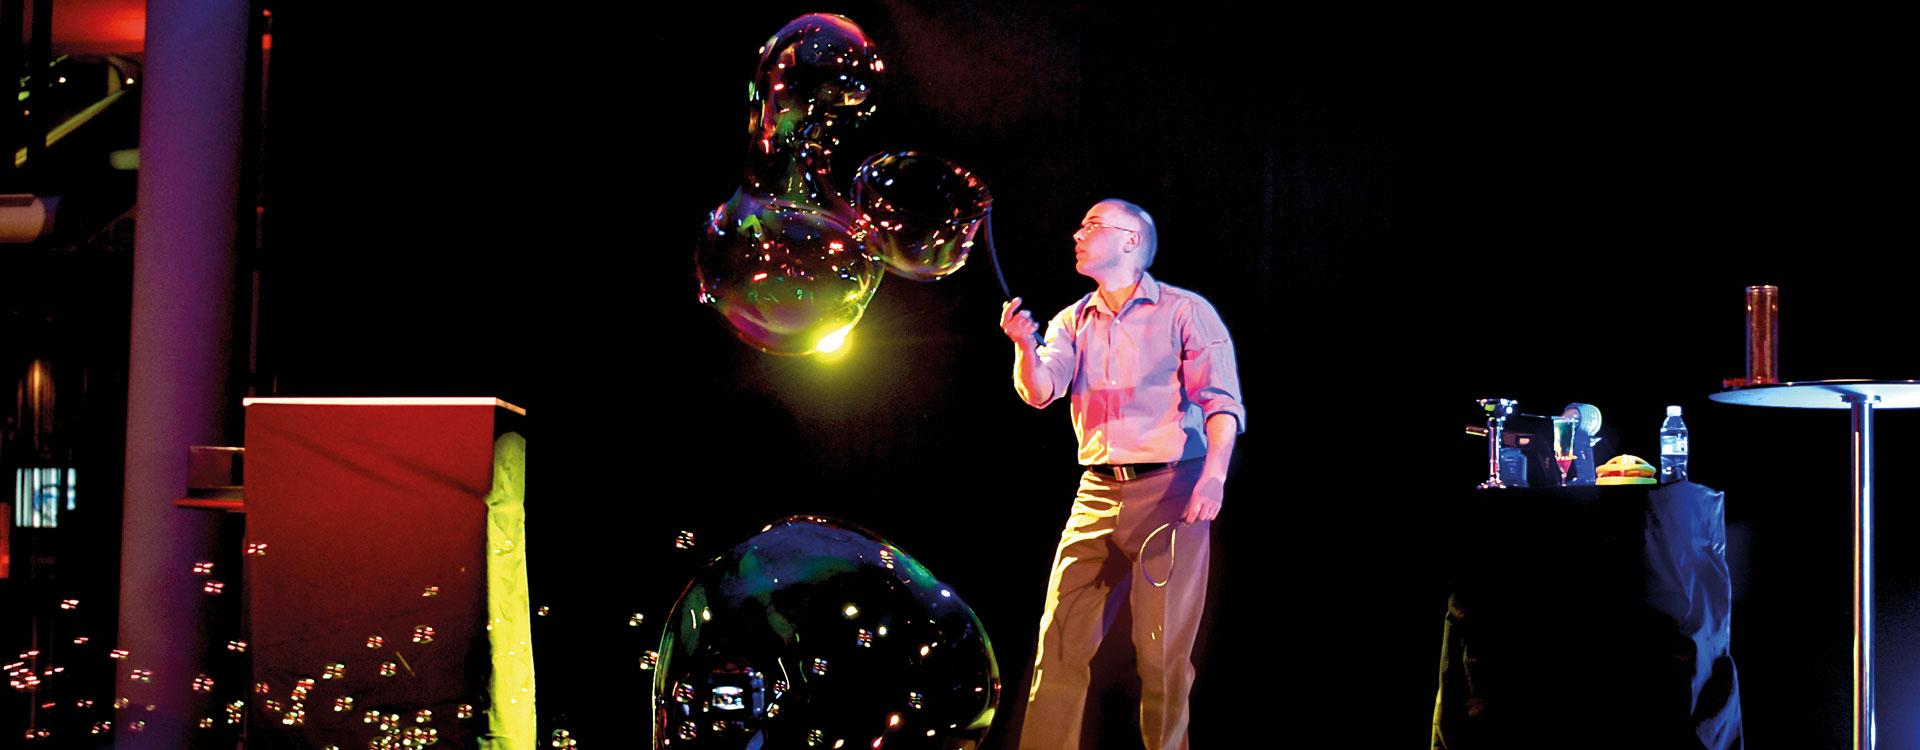 multiplication de bulle